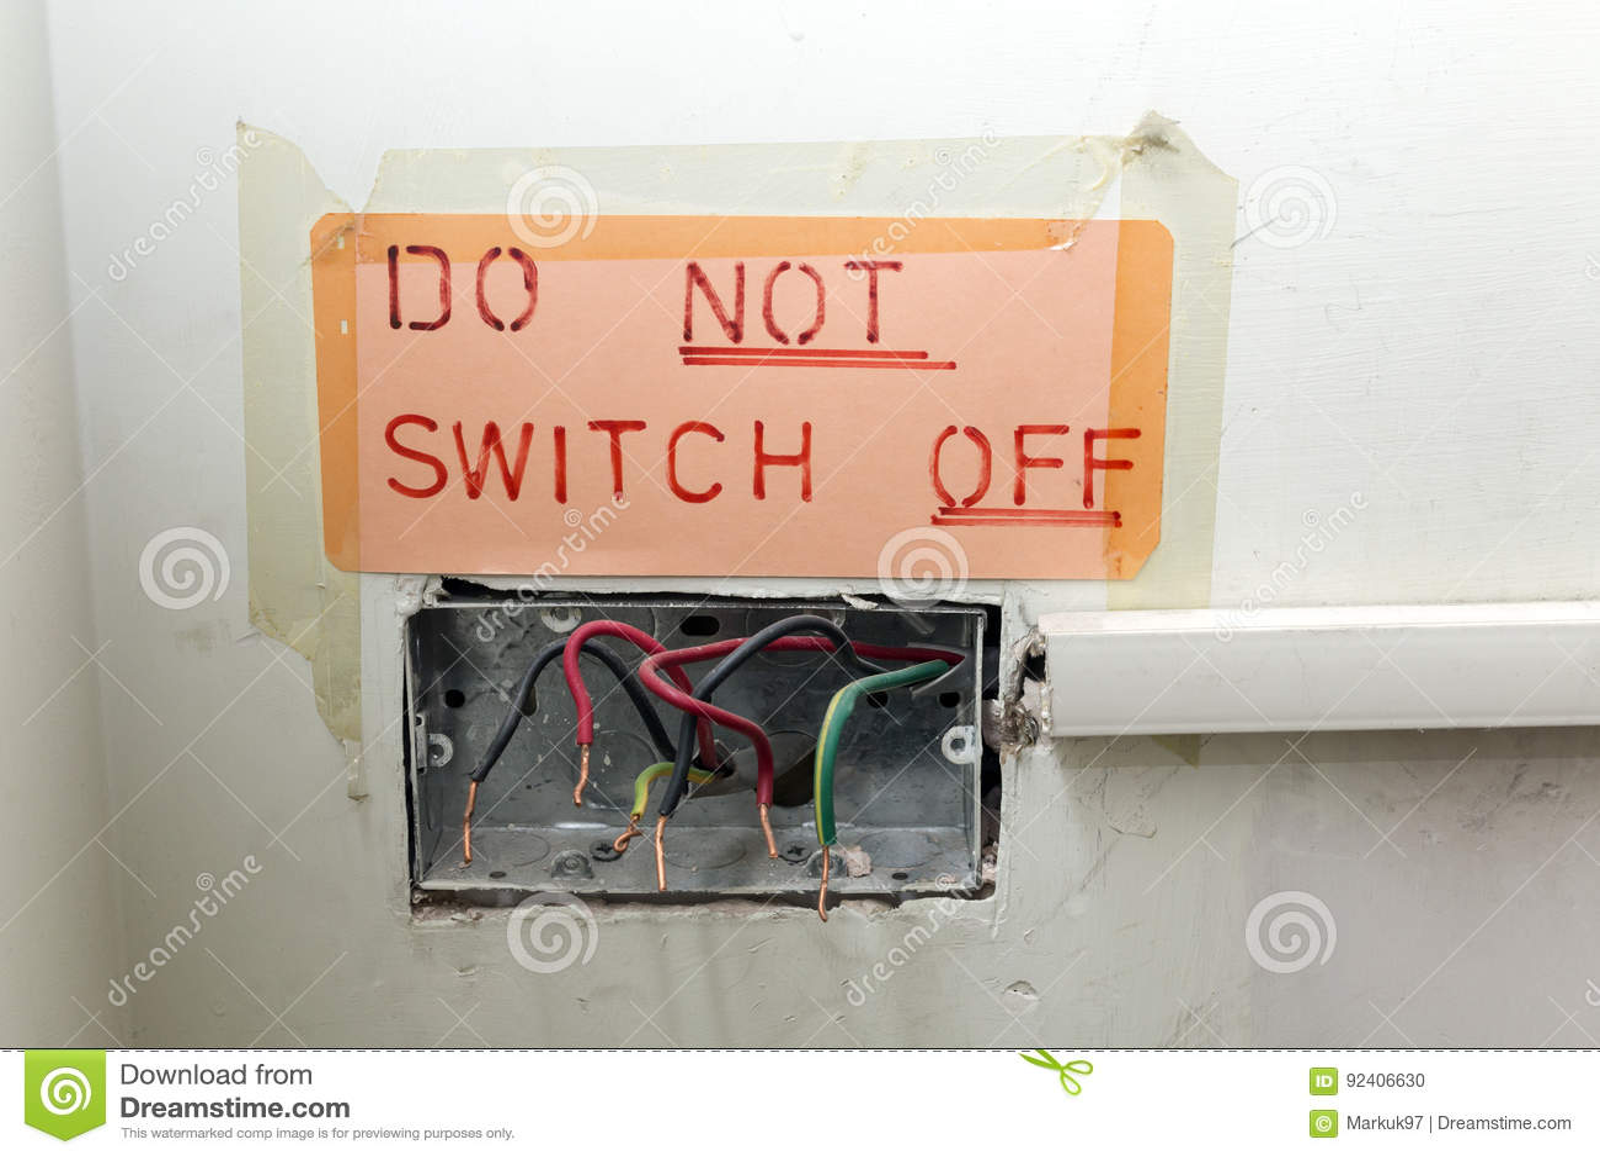 dangerous and poor quality electrical work stock photo Wiring Money Internationally Wells Fargo Wiring Money